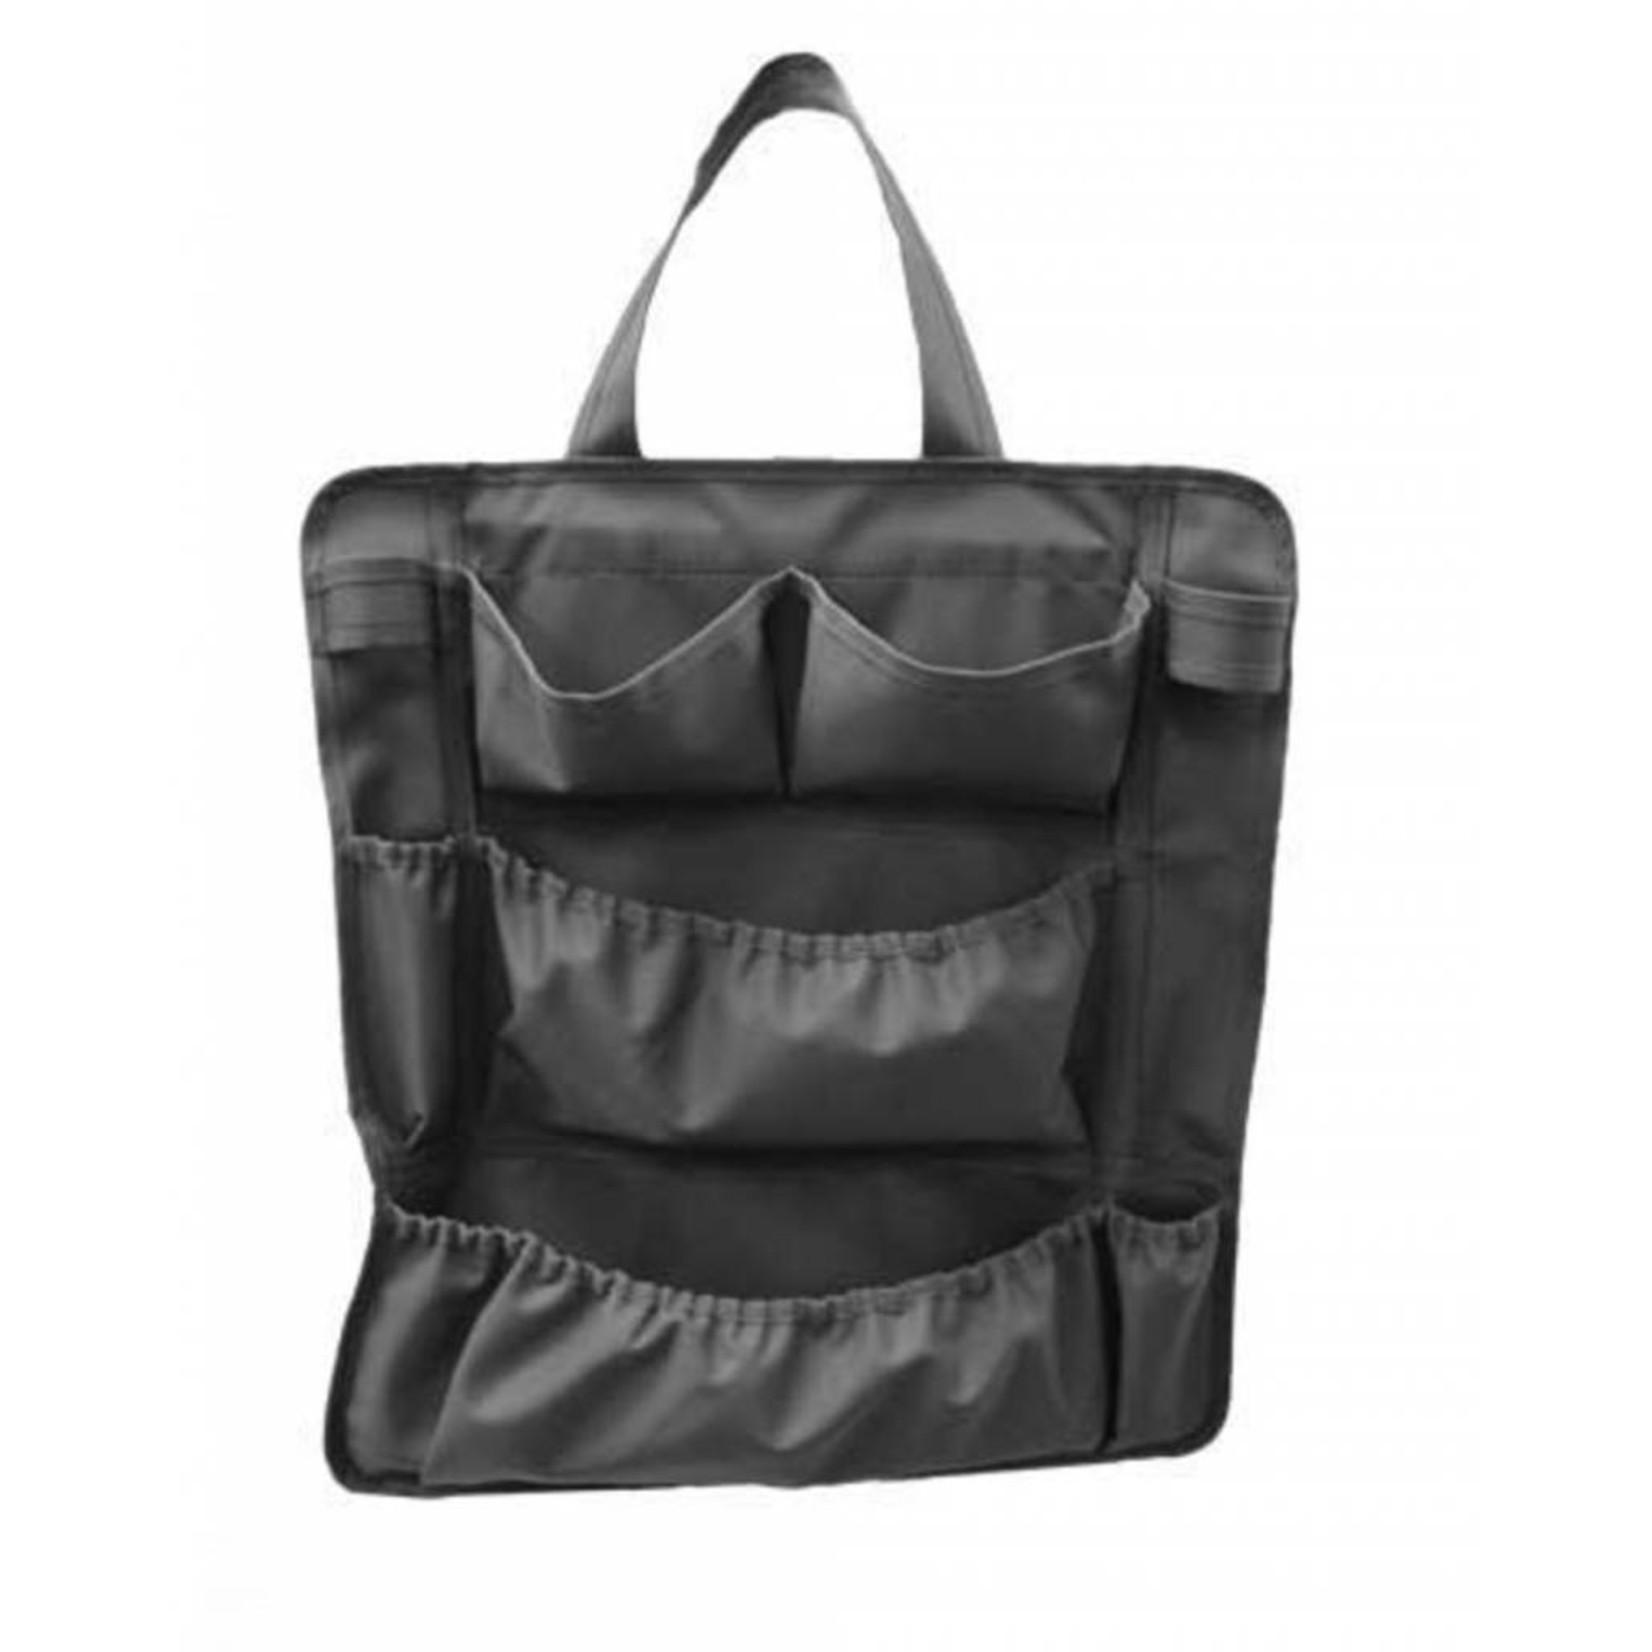 BEAM Beam CVS Tool & Caddy Bag